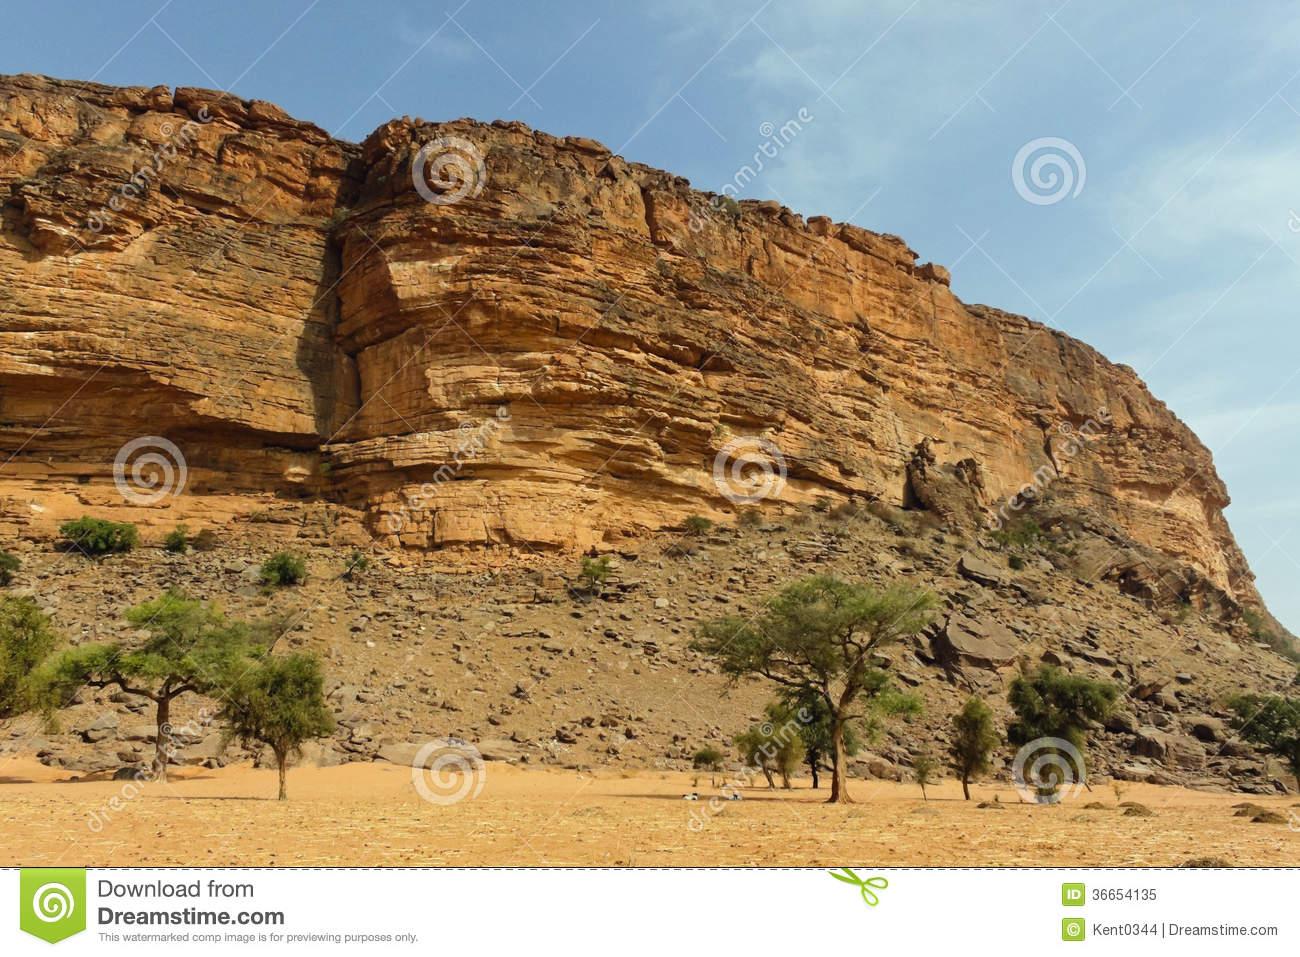 Desert And Cliff In Bandiagara Escarpment Royalty Free Stock Photo.